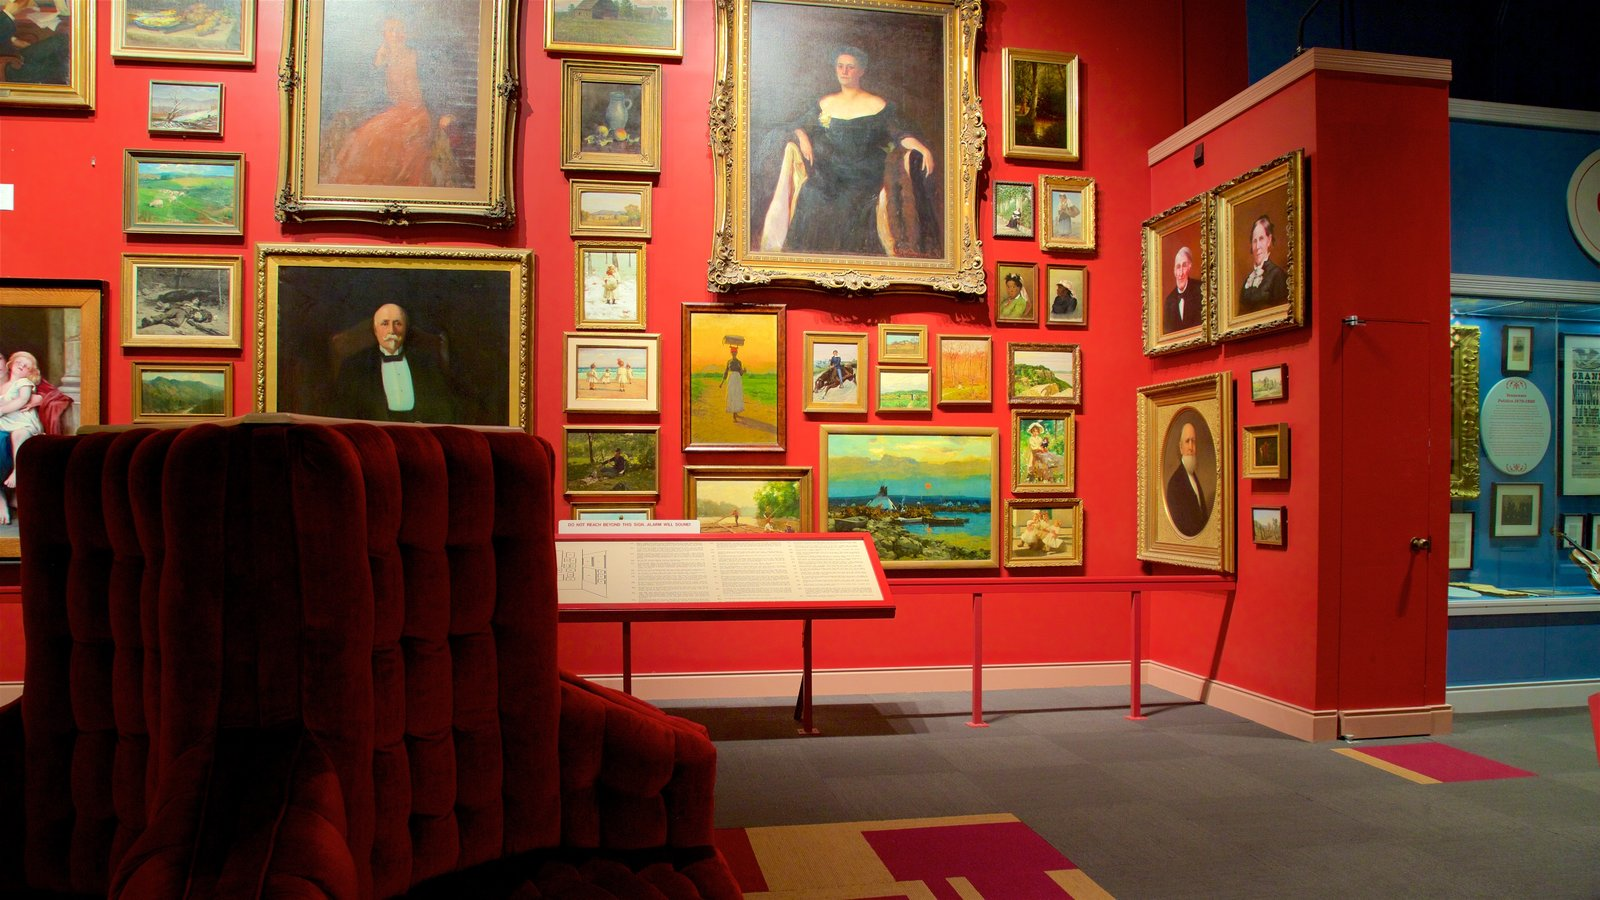 Tennessee State Museum mostrando arte y vistas interiores